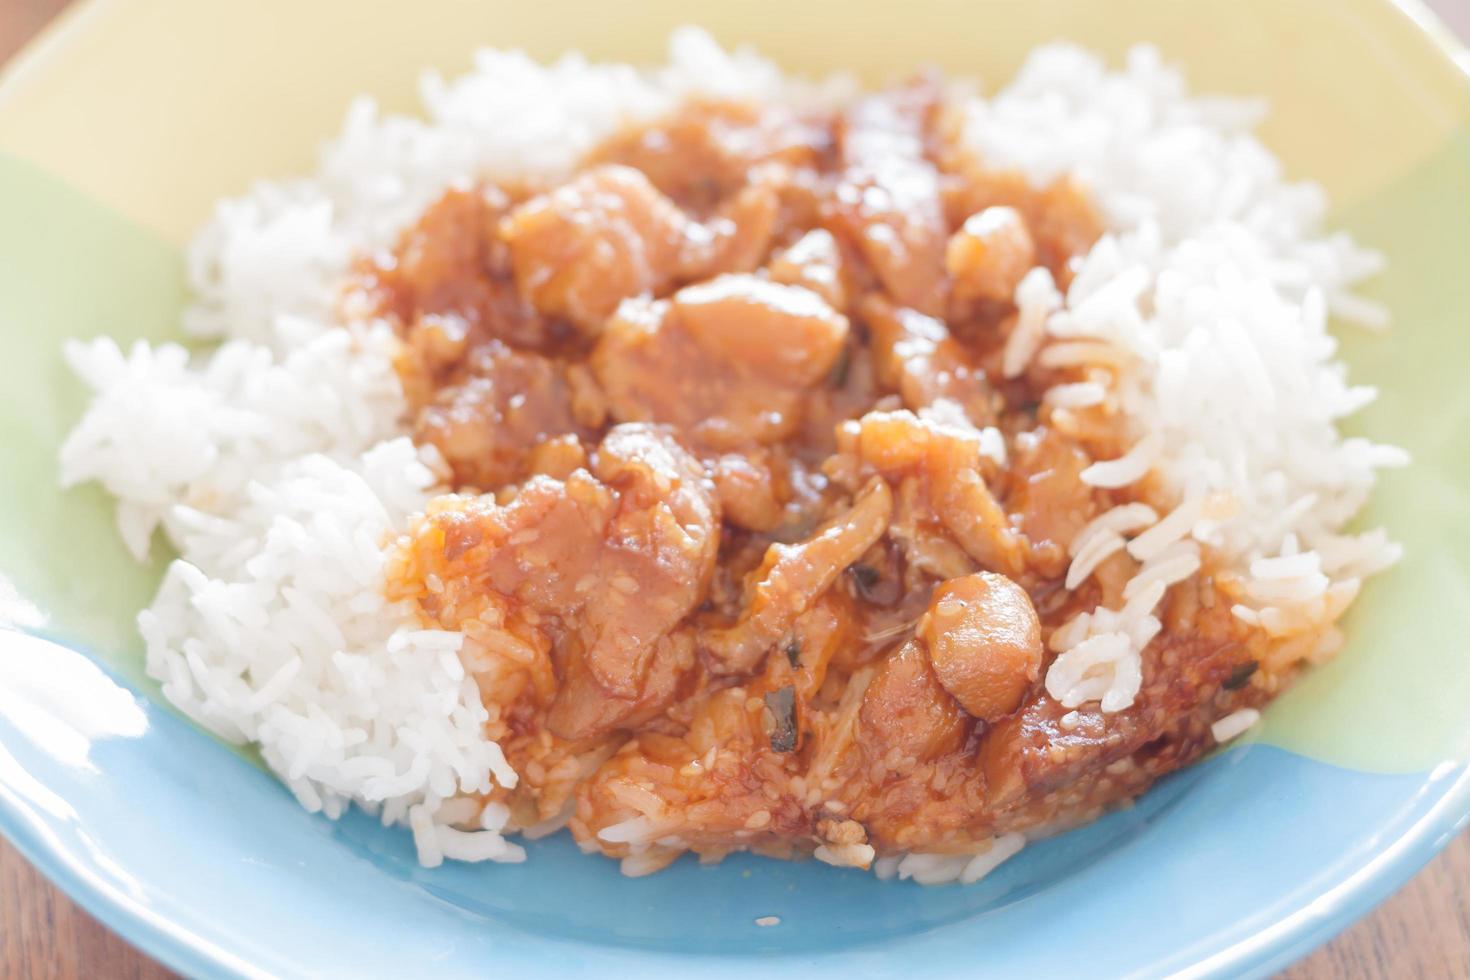 geroerd varkensvlees met saus bovenop rijst foto